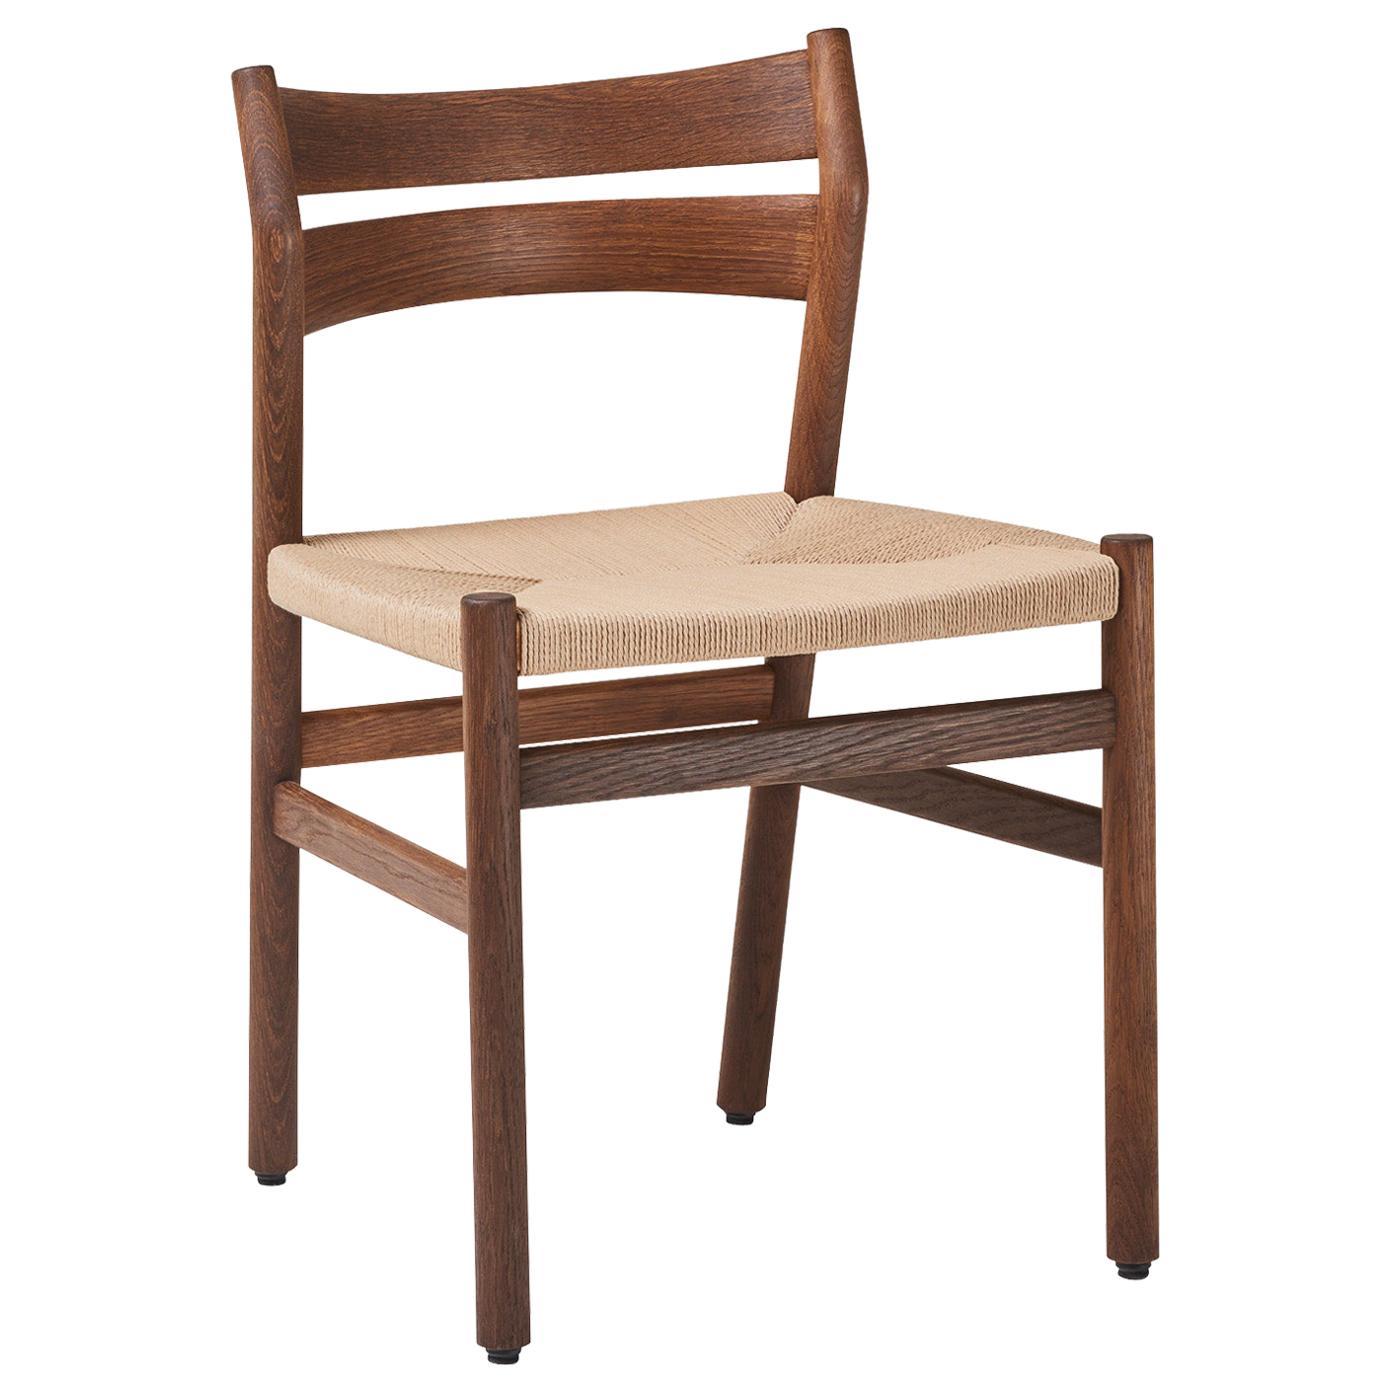 BM1 Chair by Borge Mogensen - Smoked Oak